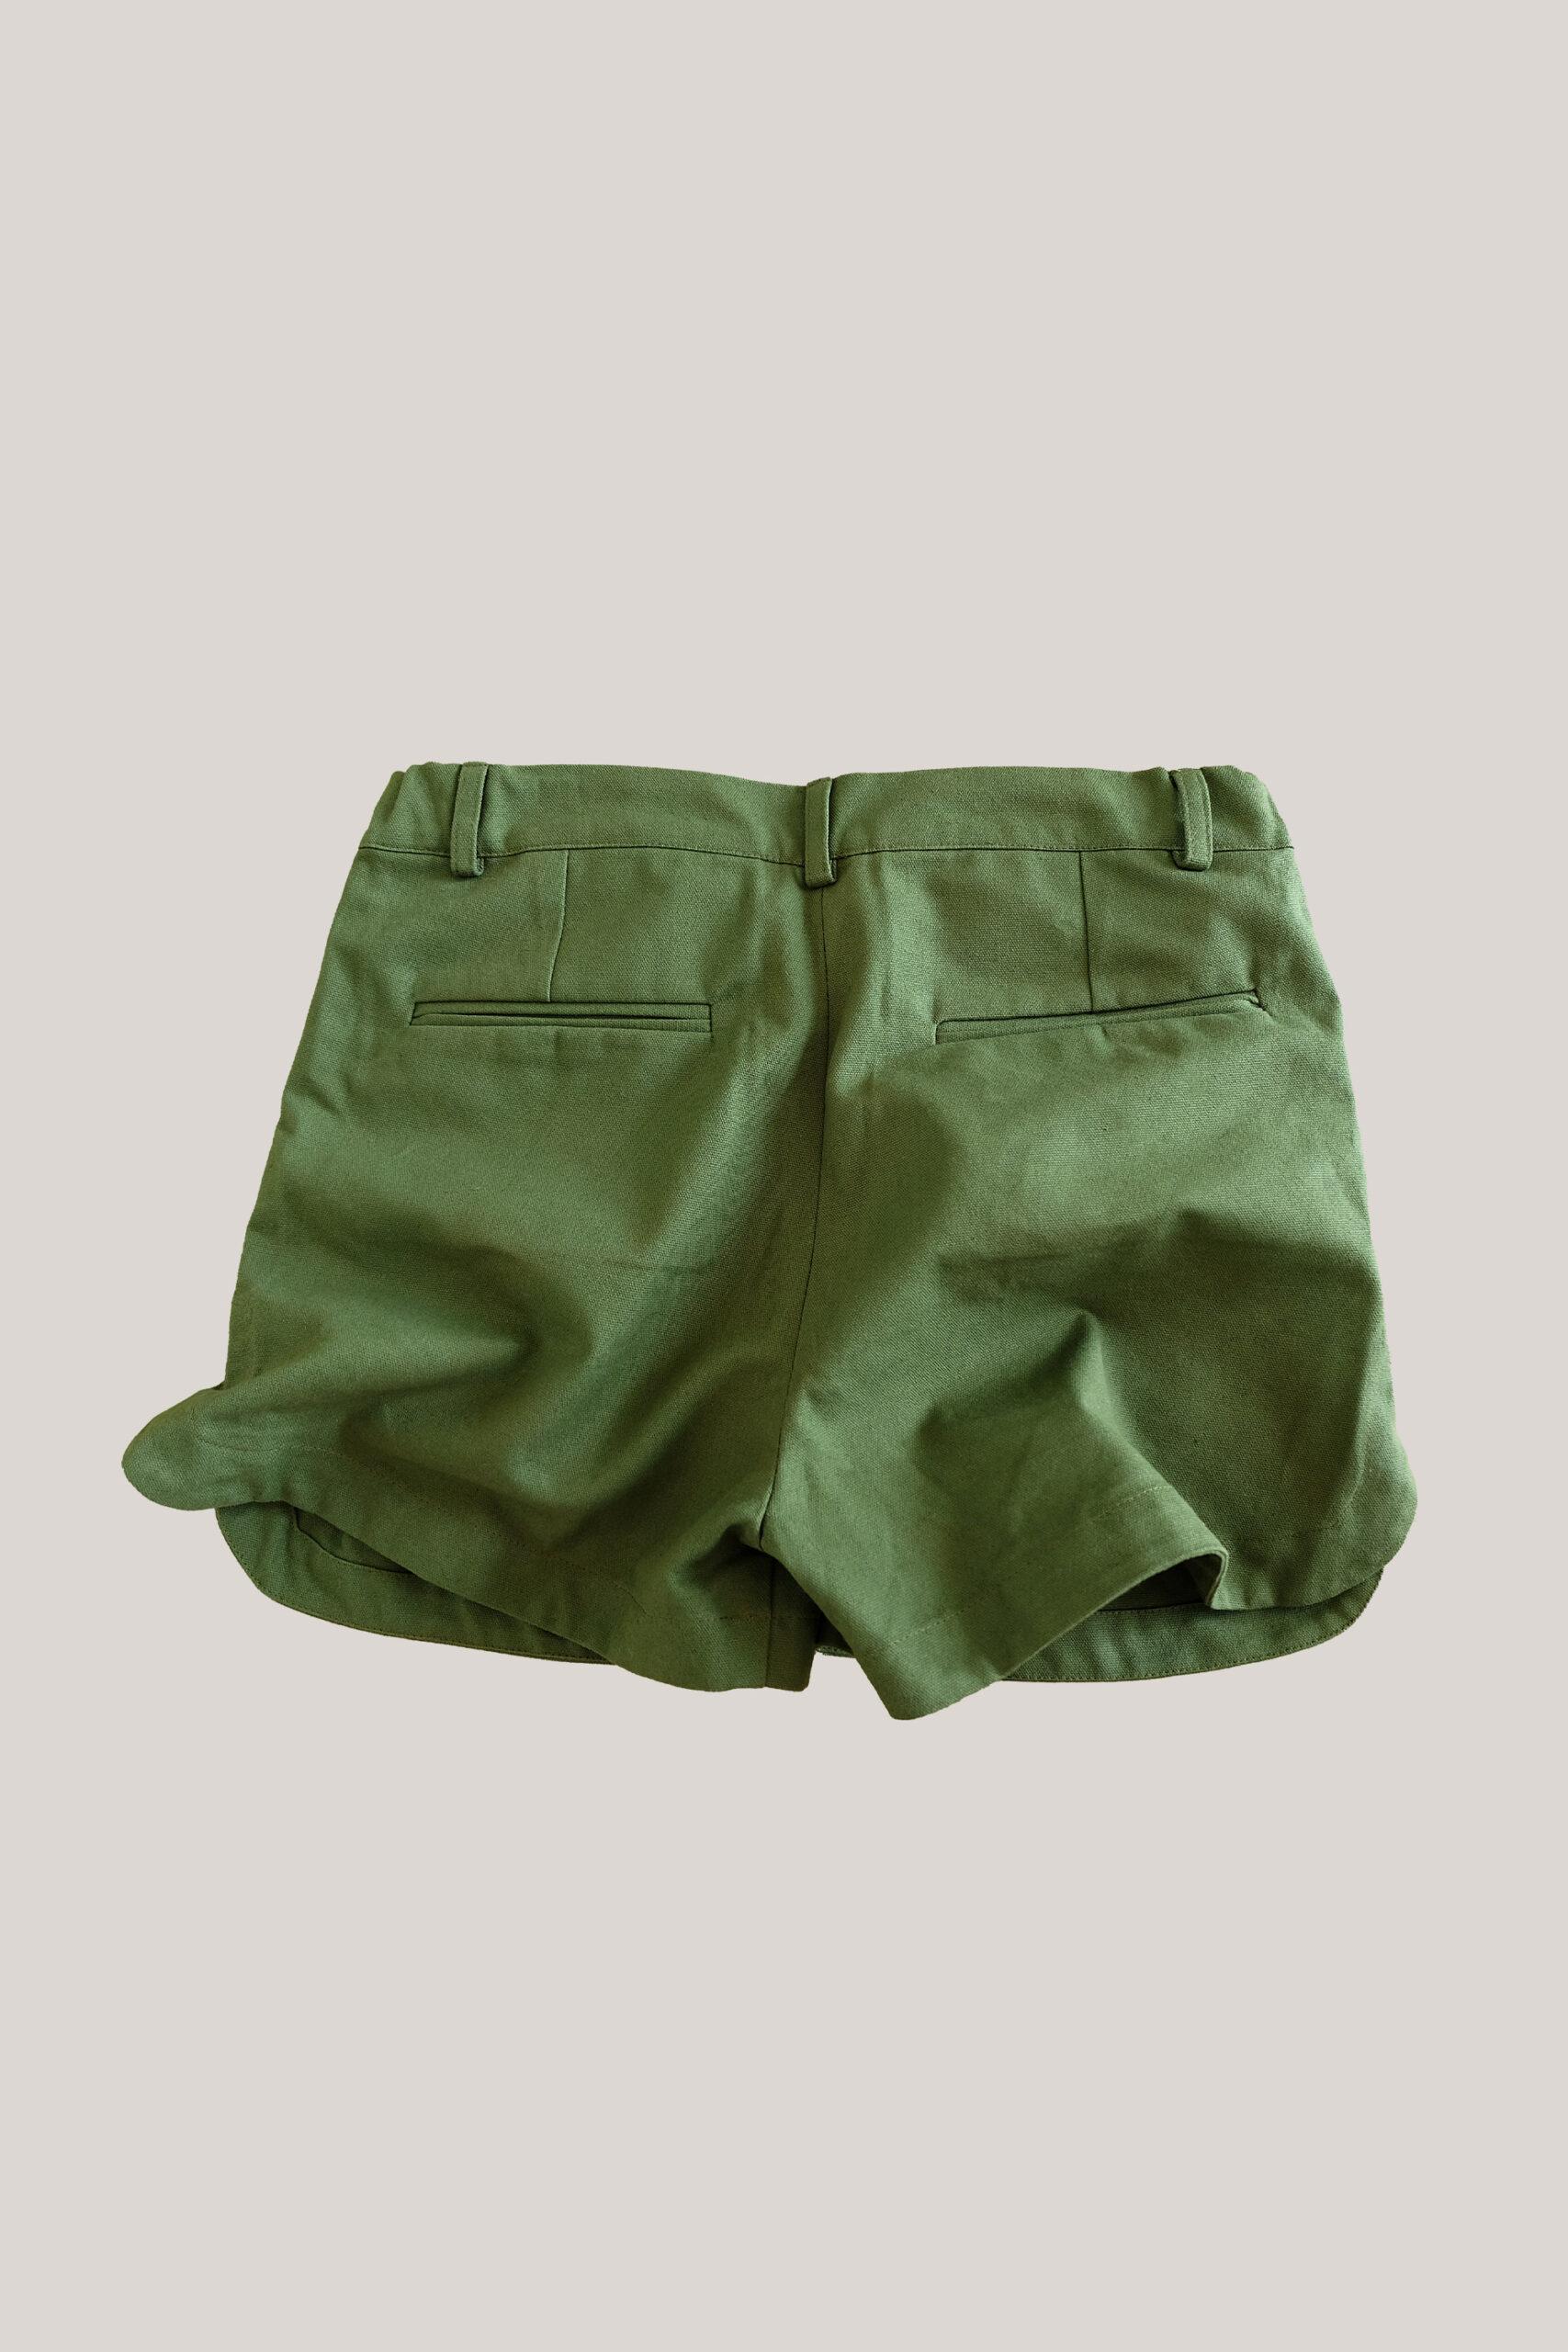 Canvas-Shorts-2